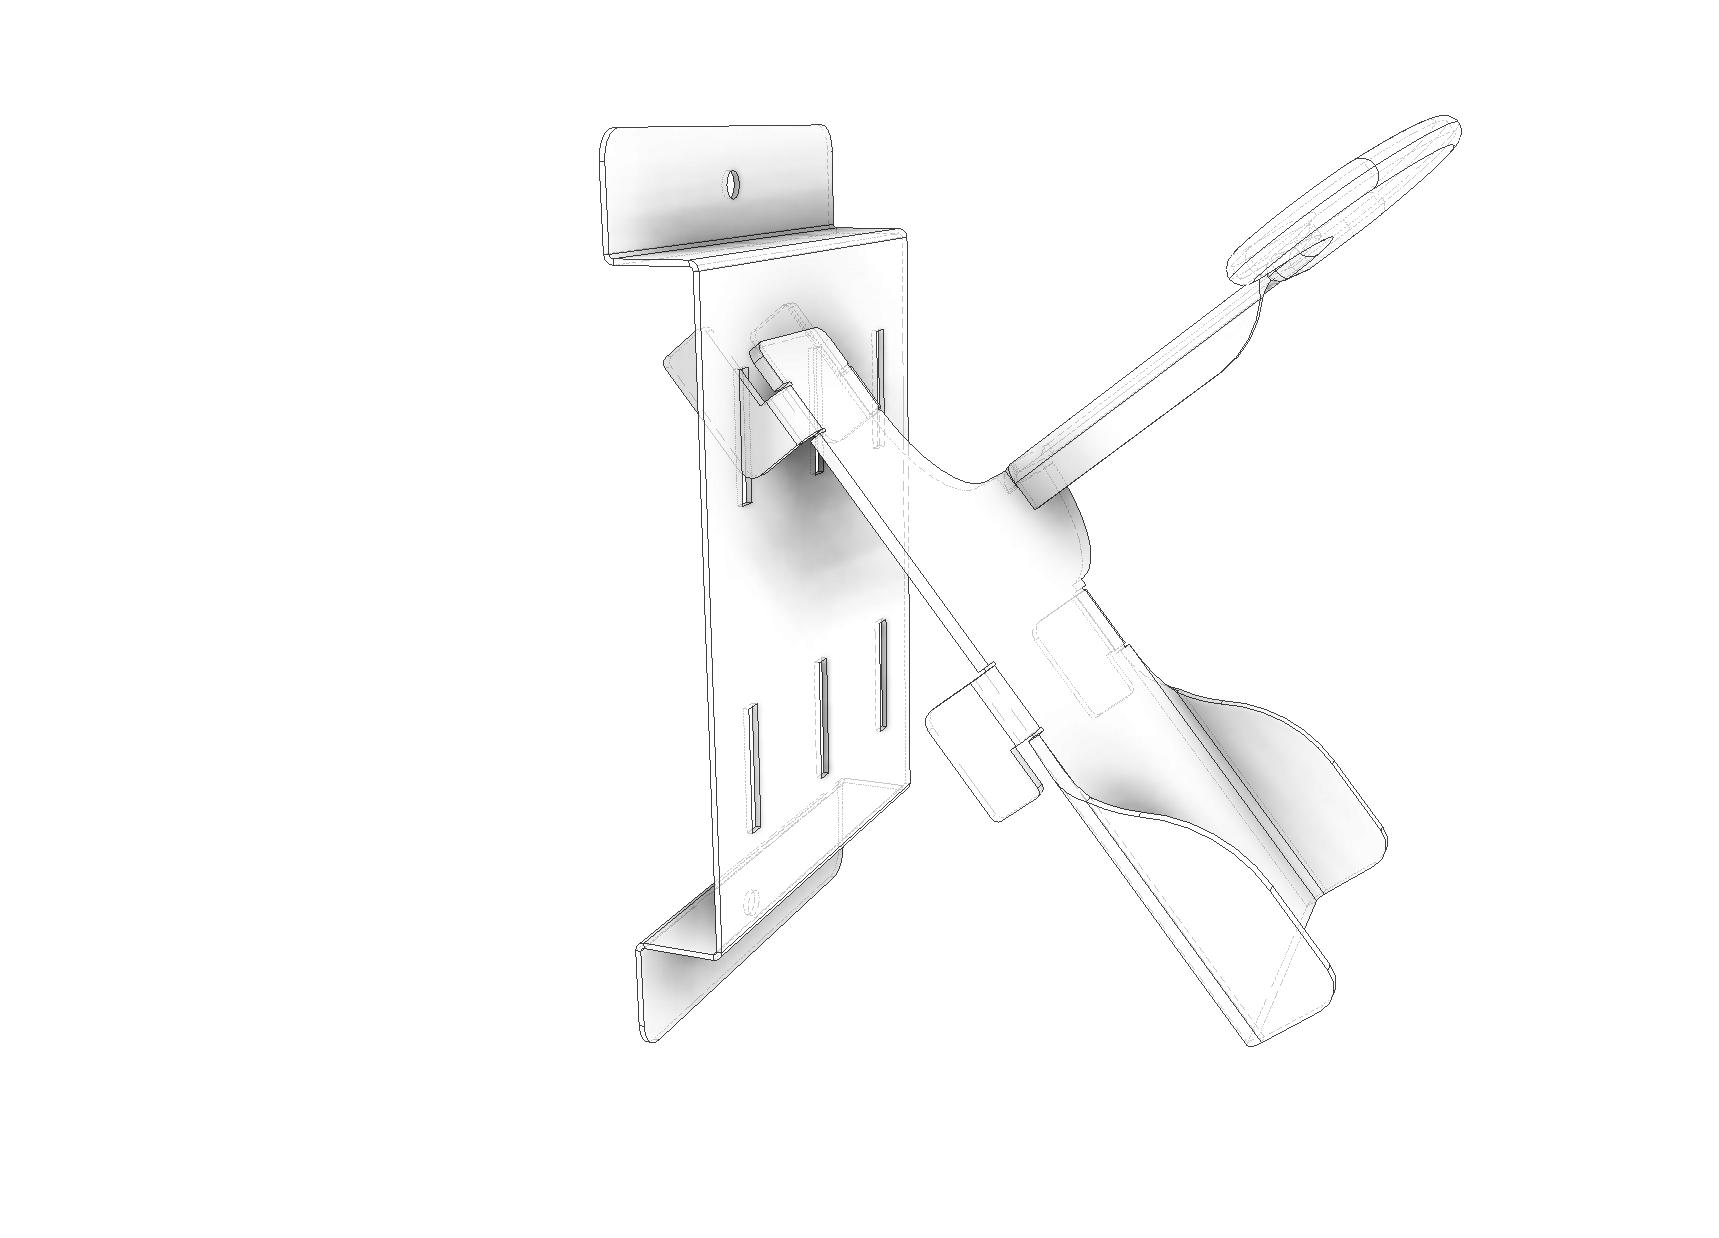 kit-1-bike-line-style-insert-1.png